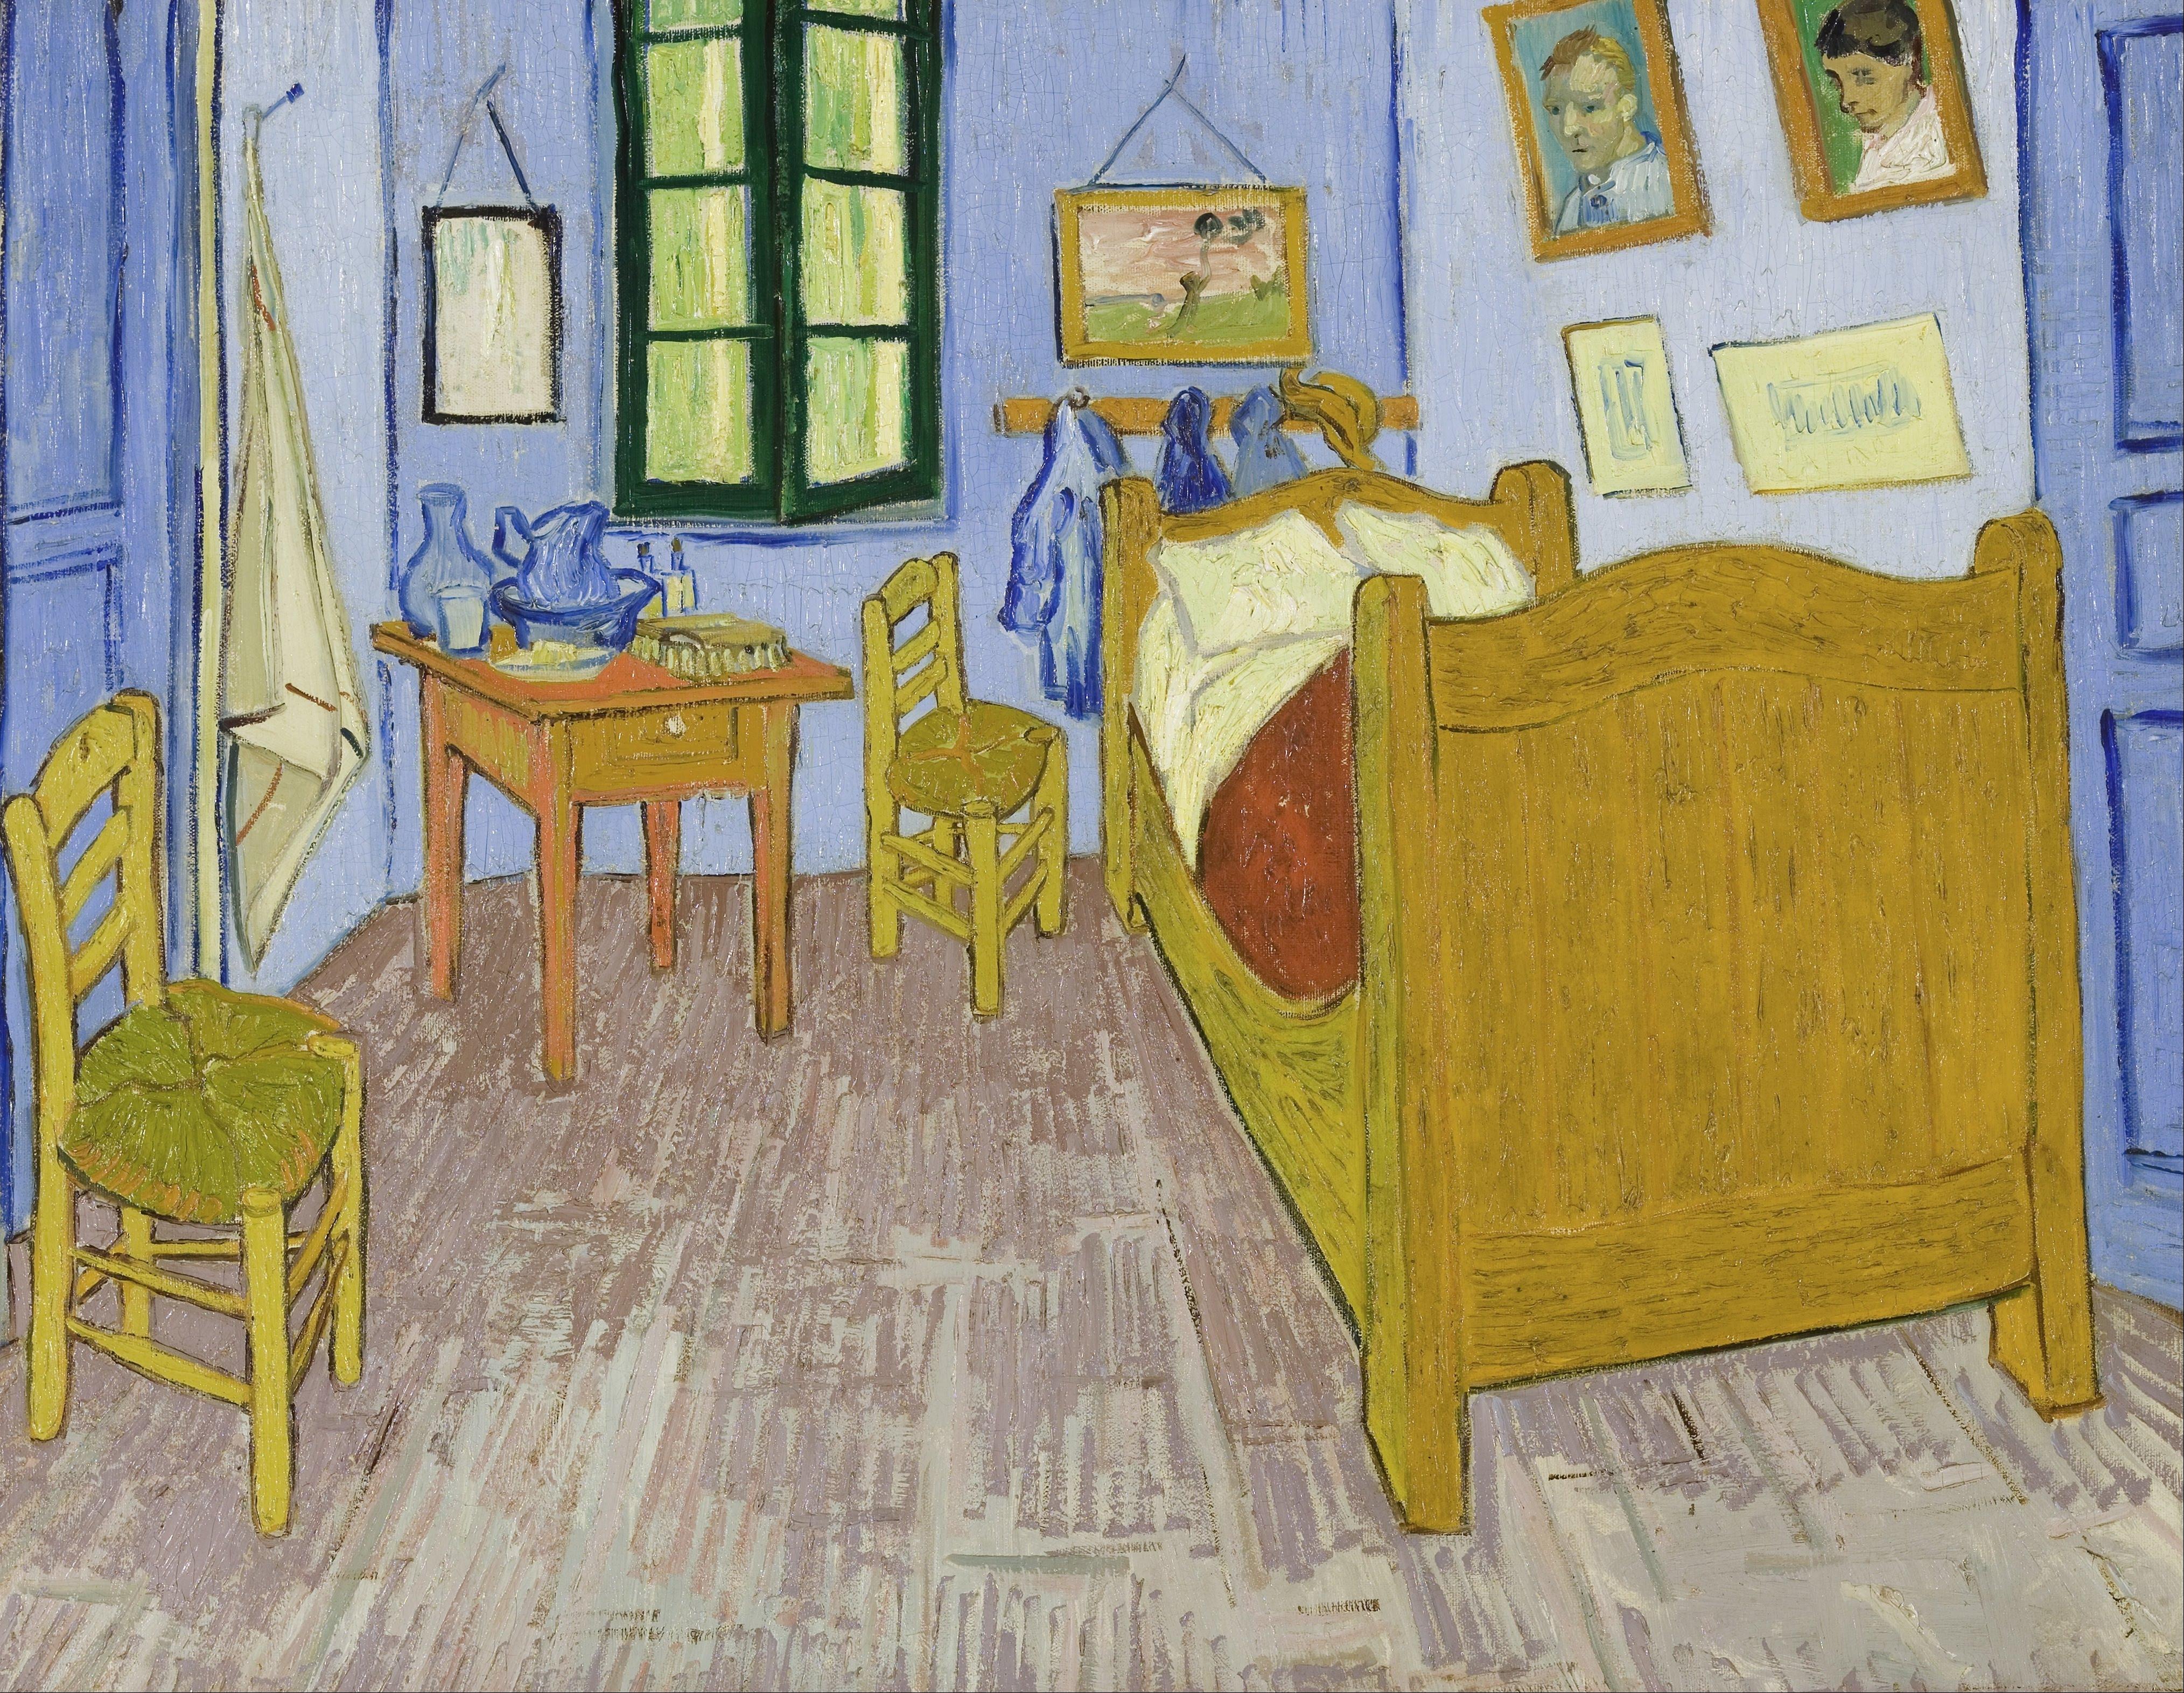 Van Gogh Year 2 Vincent